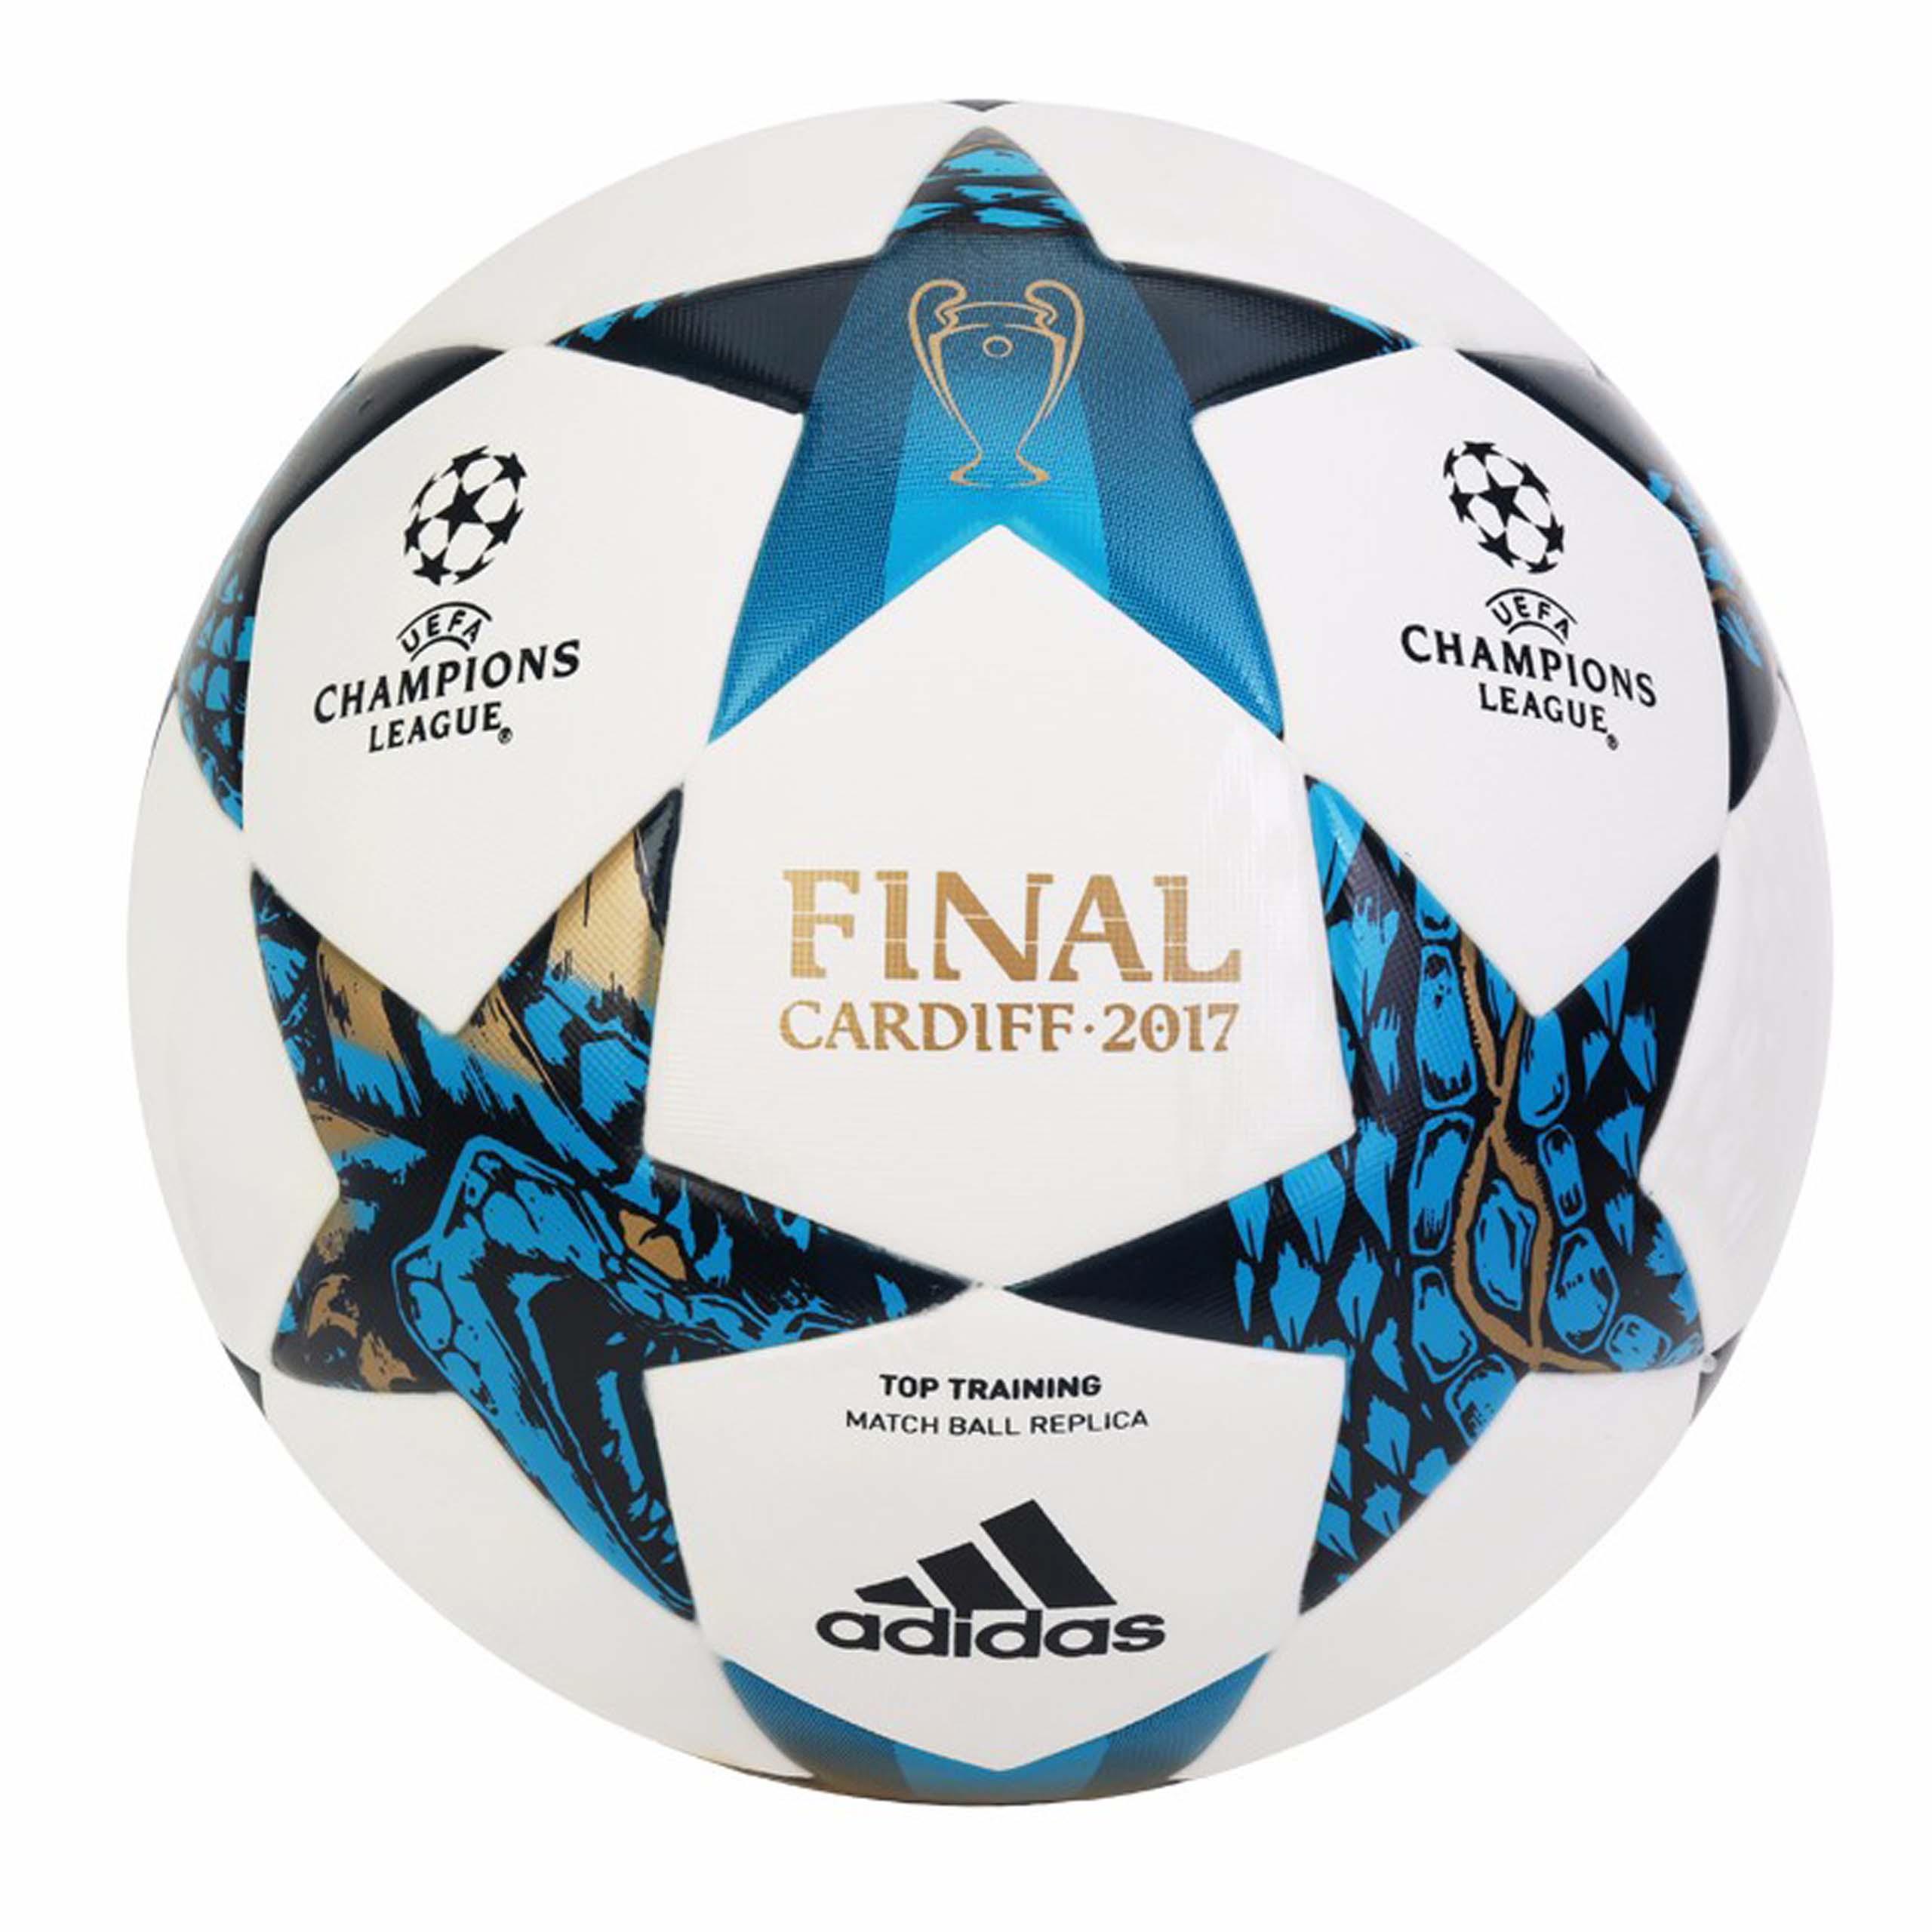 Piłka nożna adidas Champions League Finale 17 Cardiff Top Training AZ9609 rozm. 5